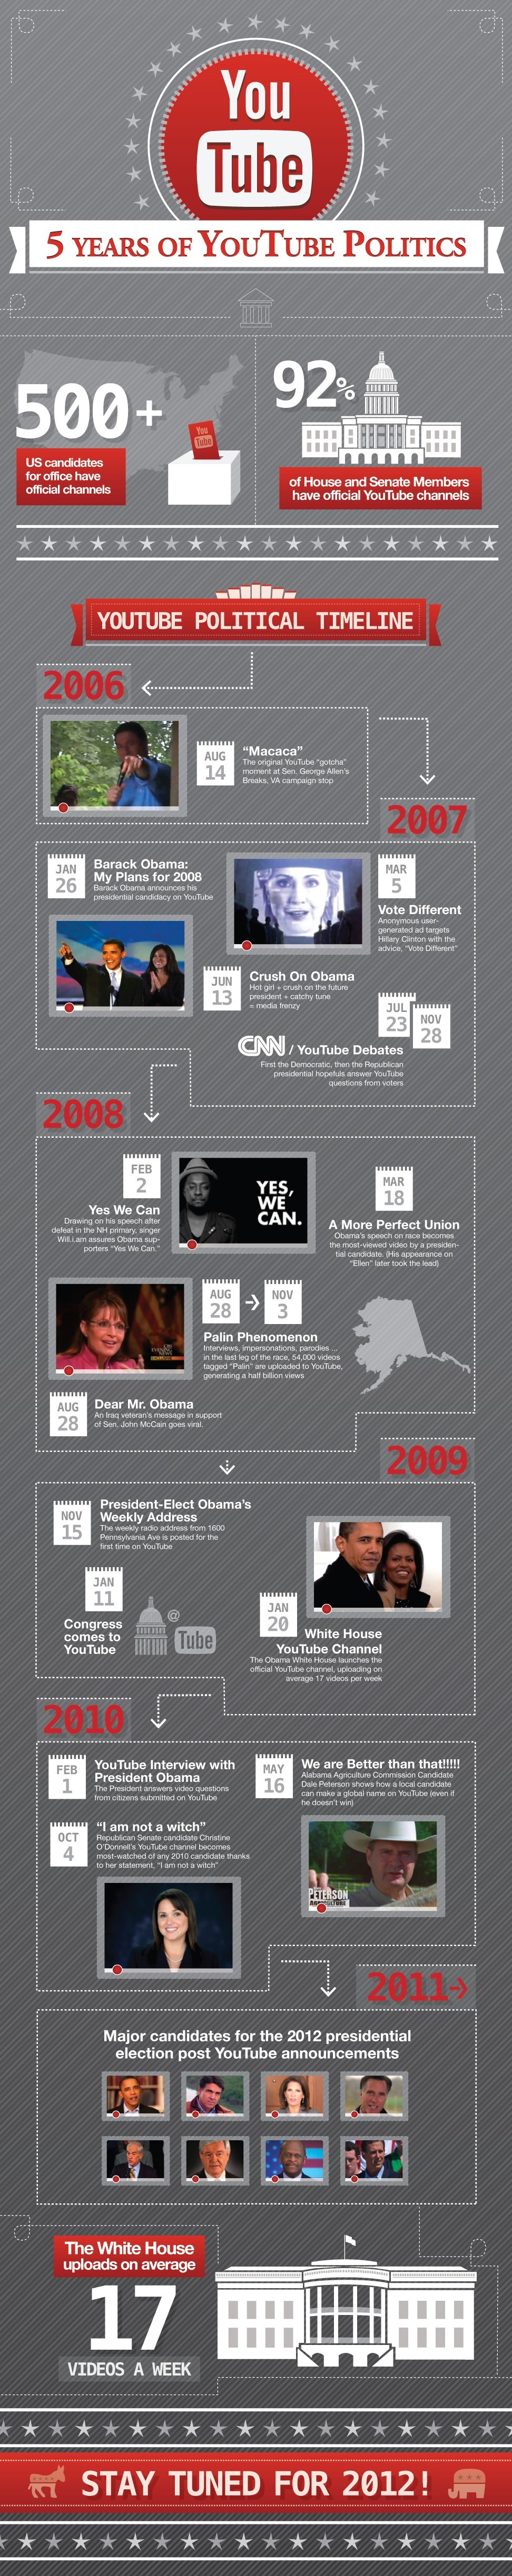 5 years of YouTube politics